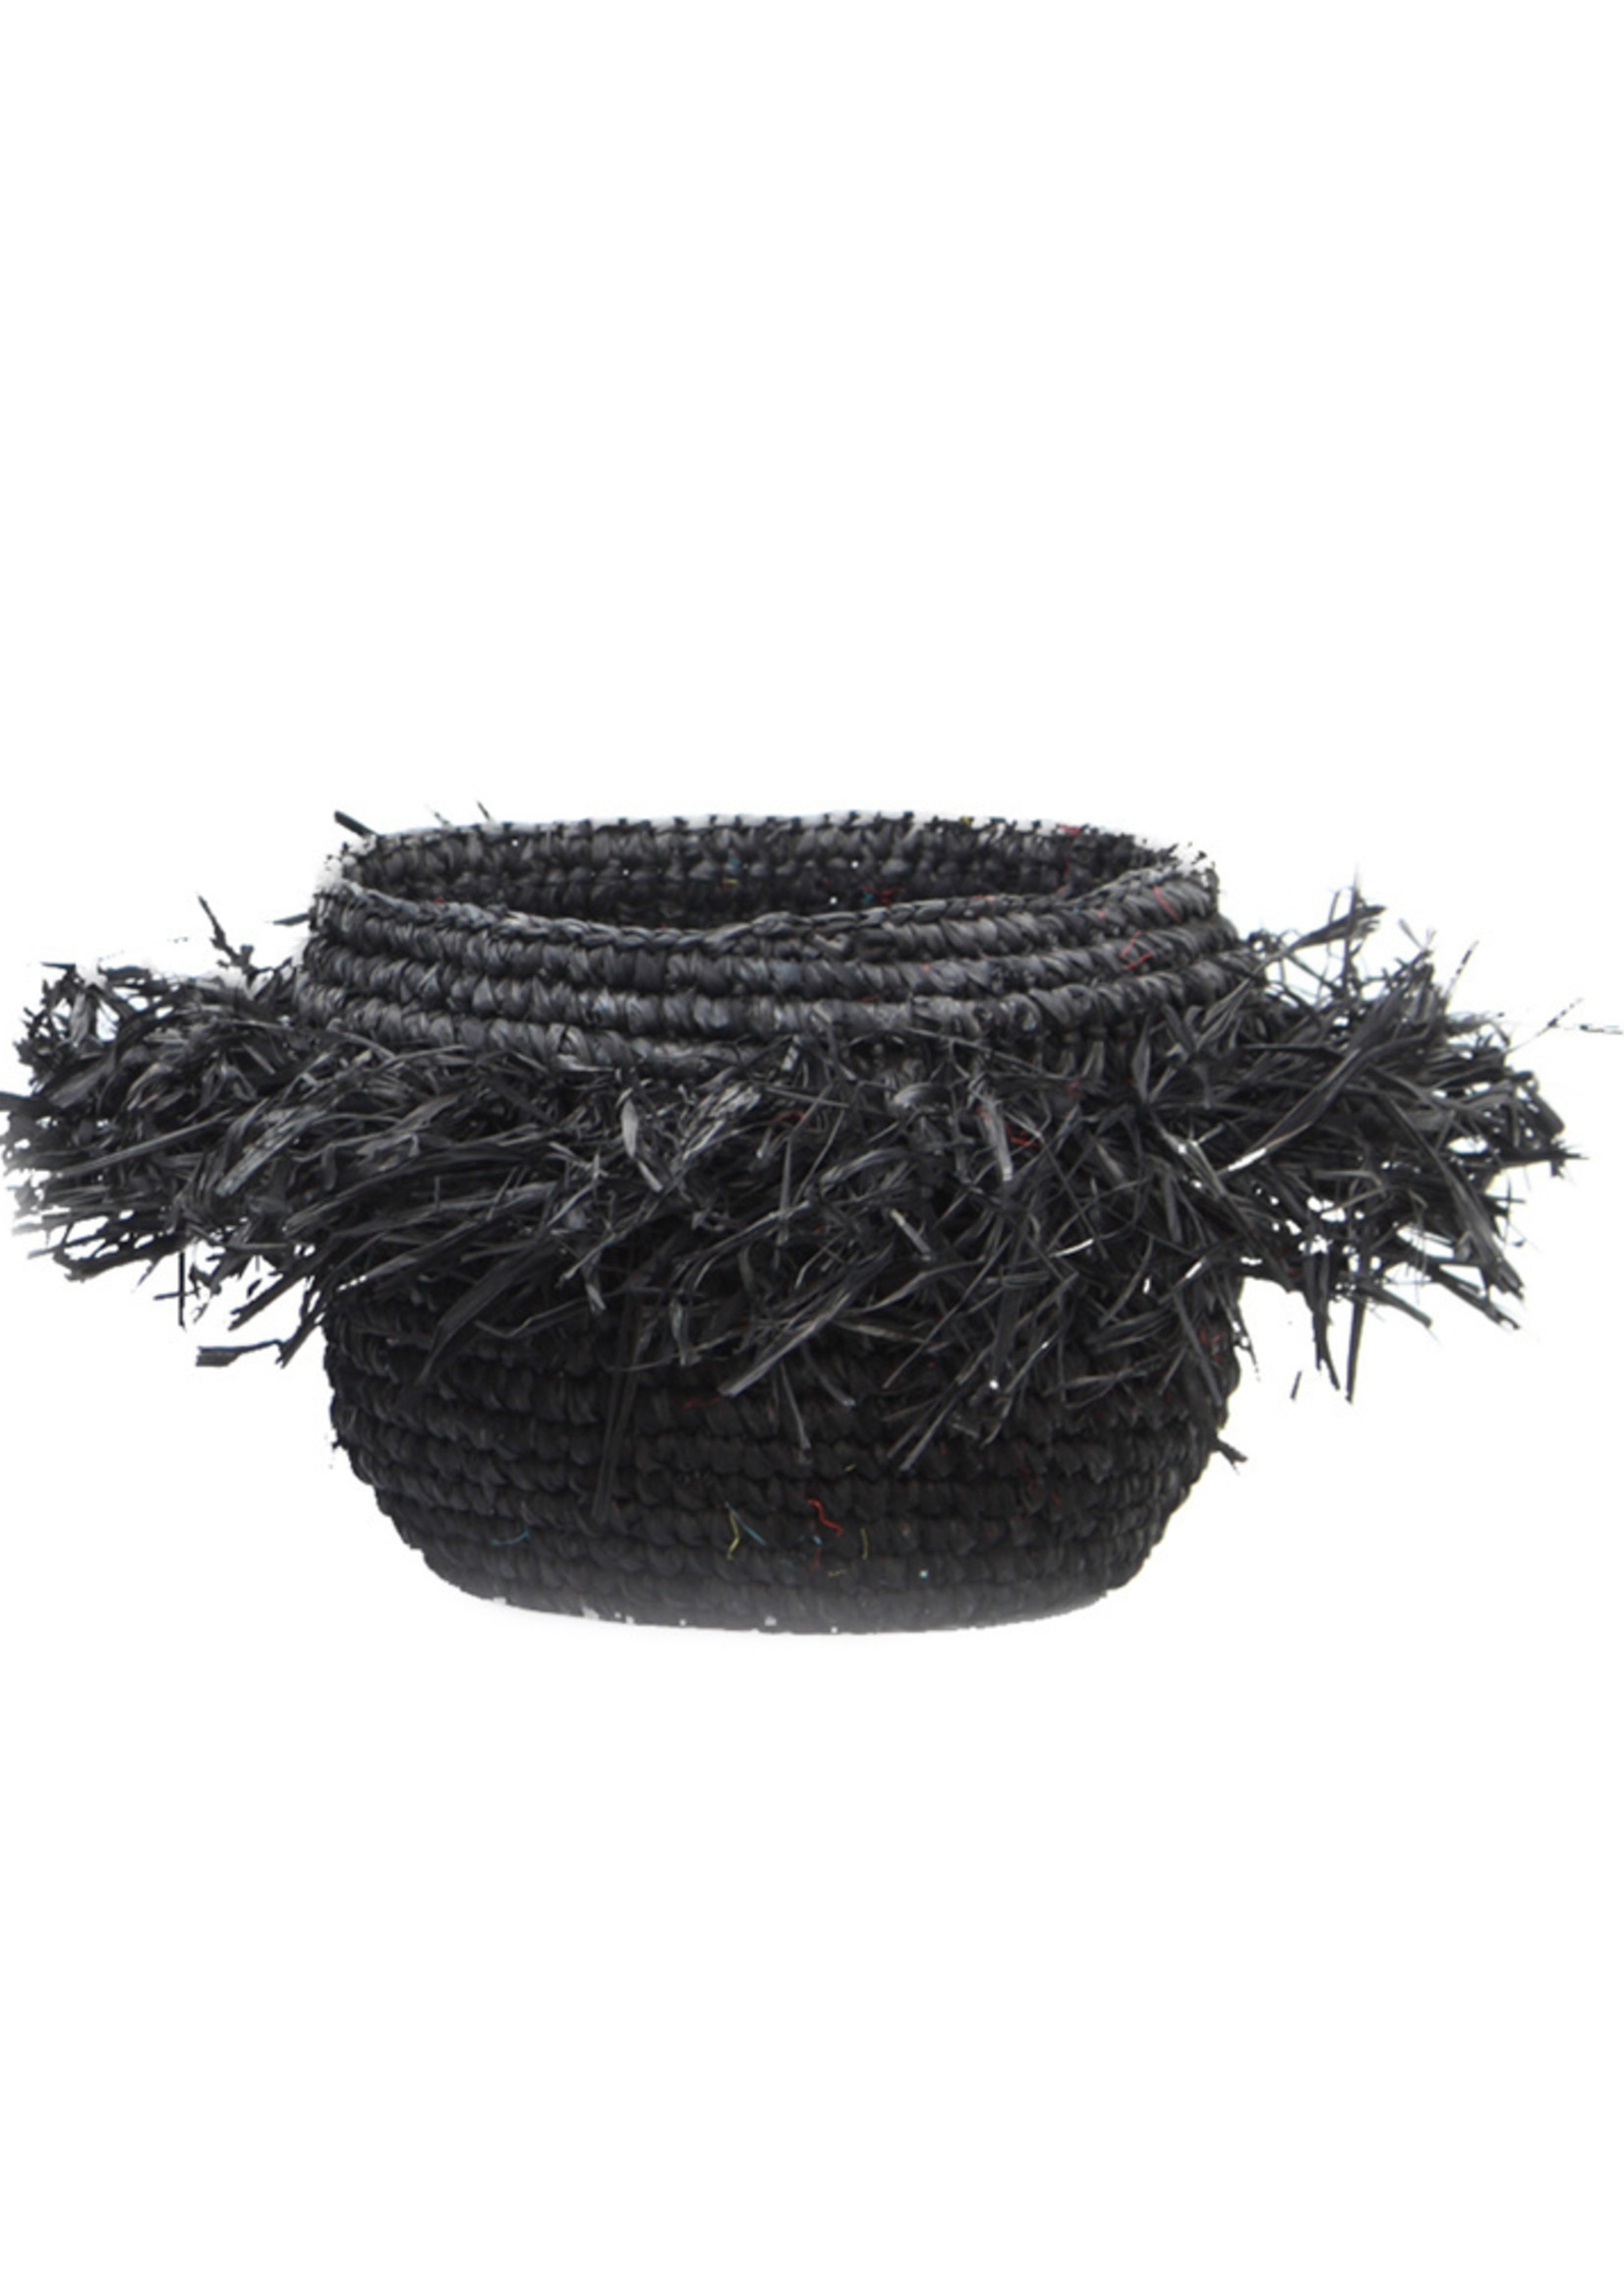 The Raffia Bowl - Black - S